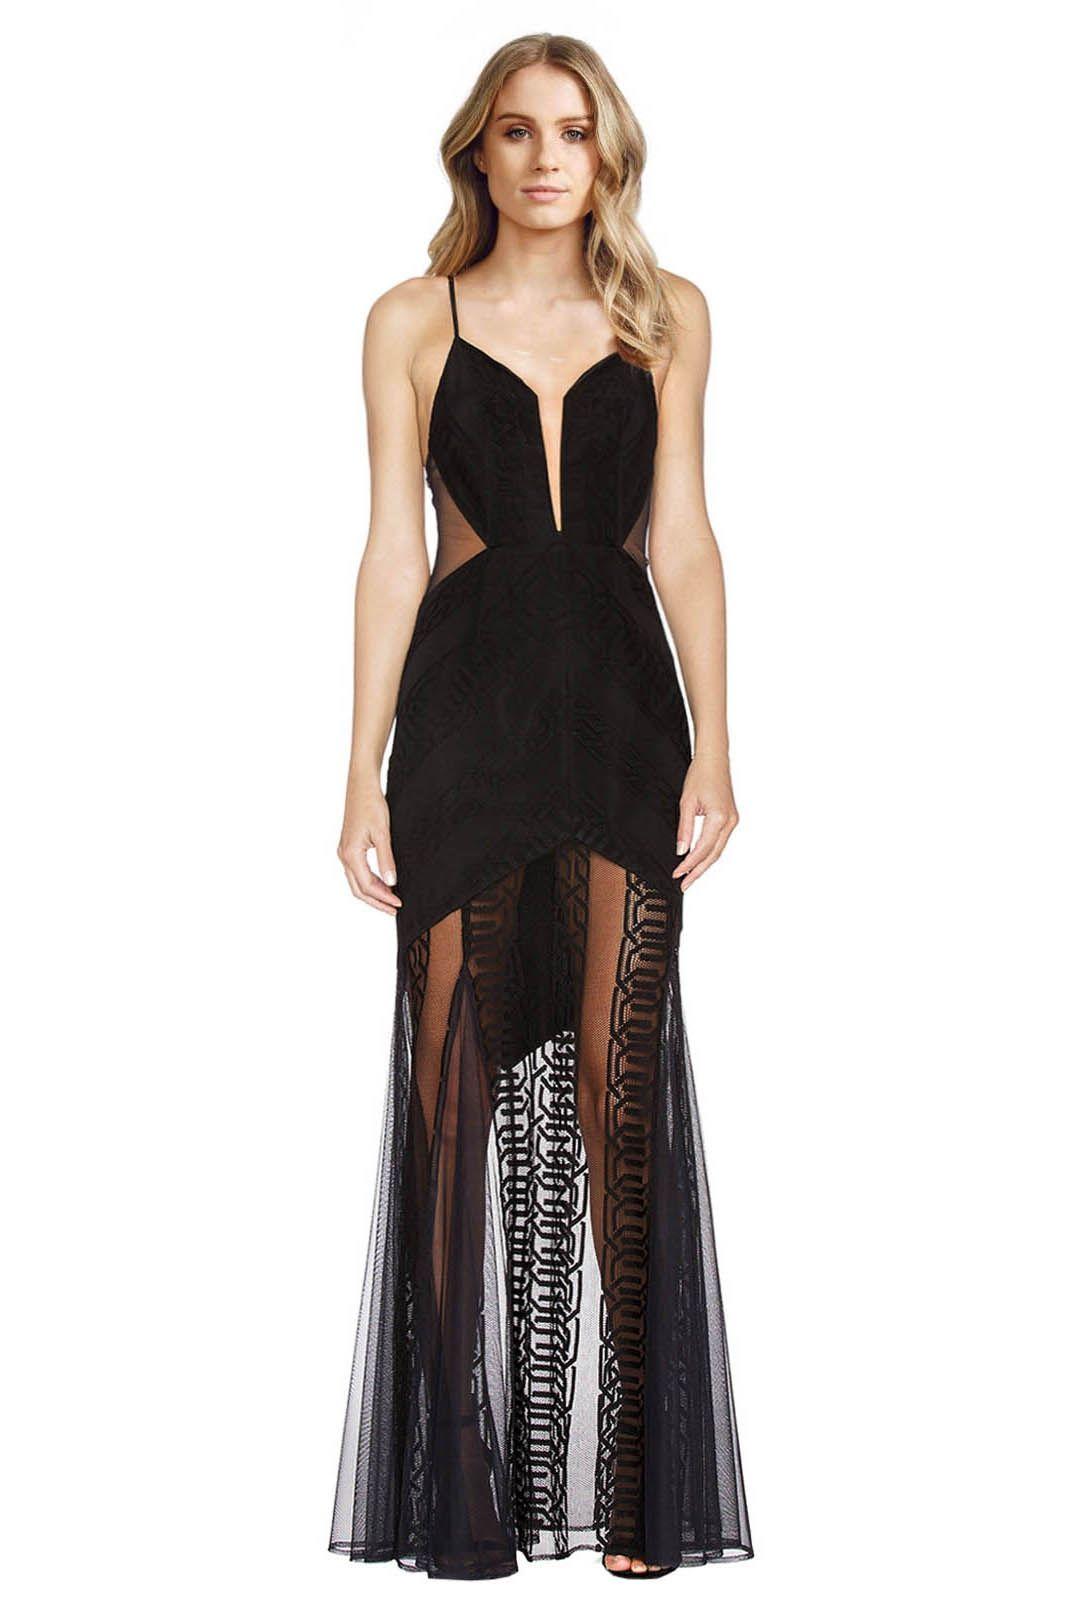 Shona Joy - Arabesque Maxi Dress - Black - Front